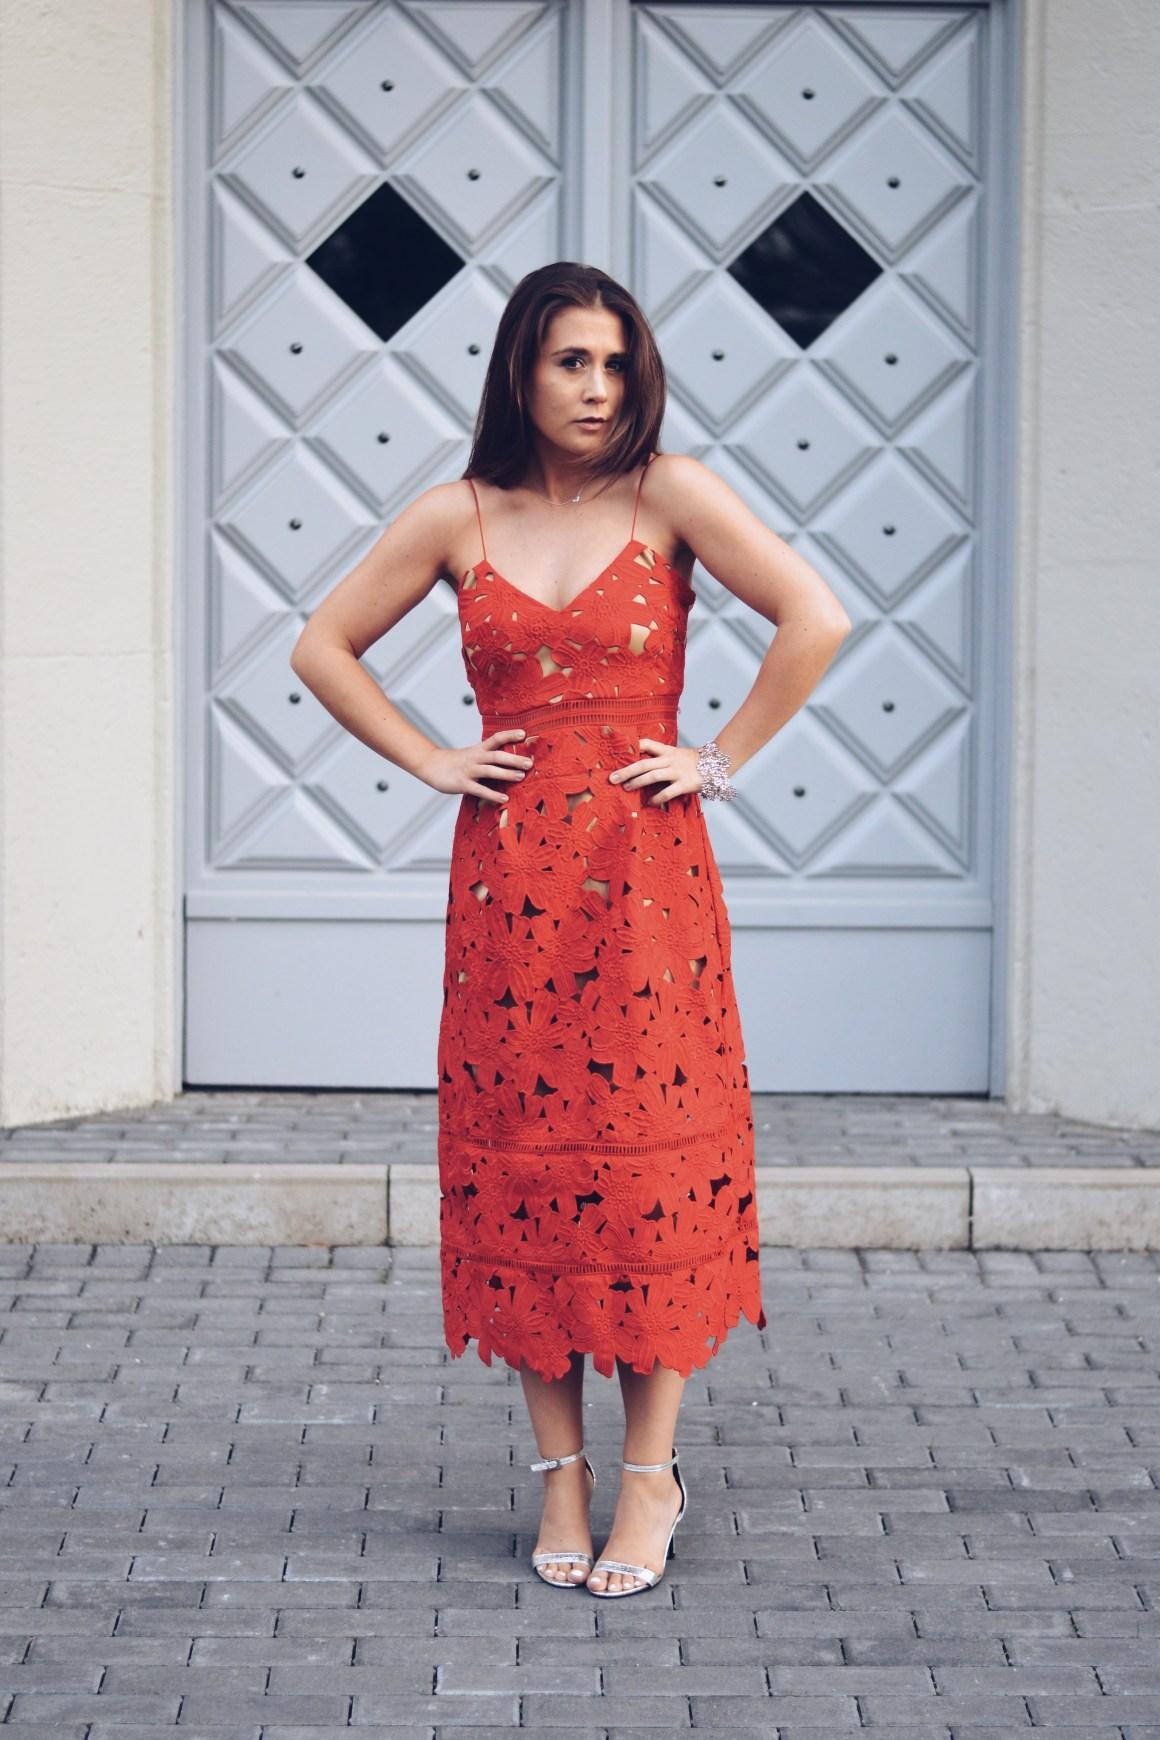 allthatchoices sommerkleid hippie florales häkelkleid rot rotes kleid spaghettiträgerkleid nakd kleid boho fashionblogger häkelkleid natürliche haarfarbe bronde blumenkleid